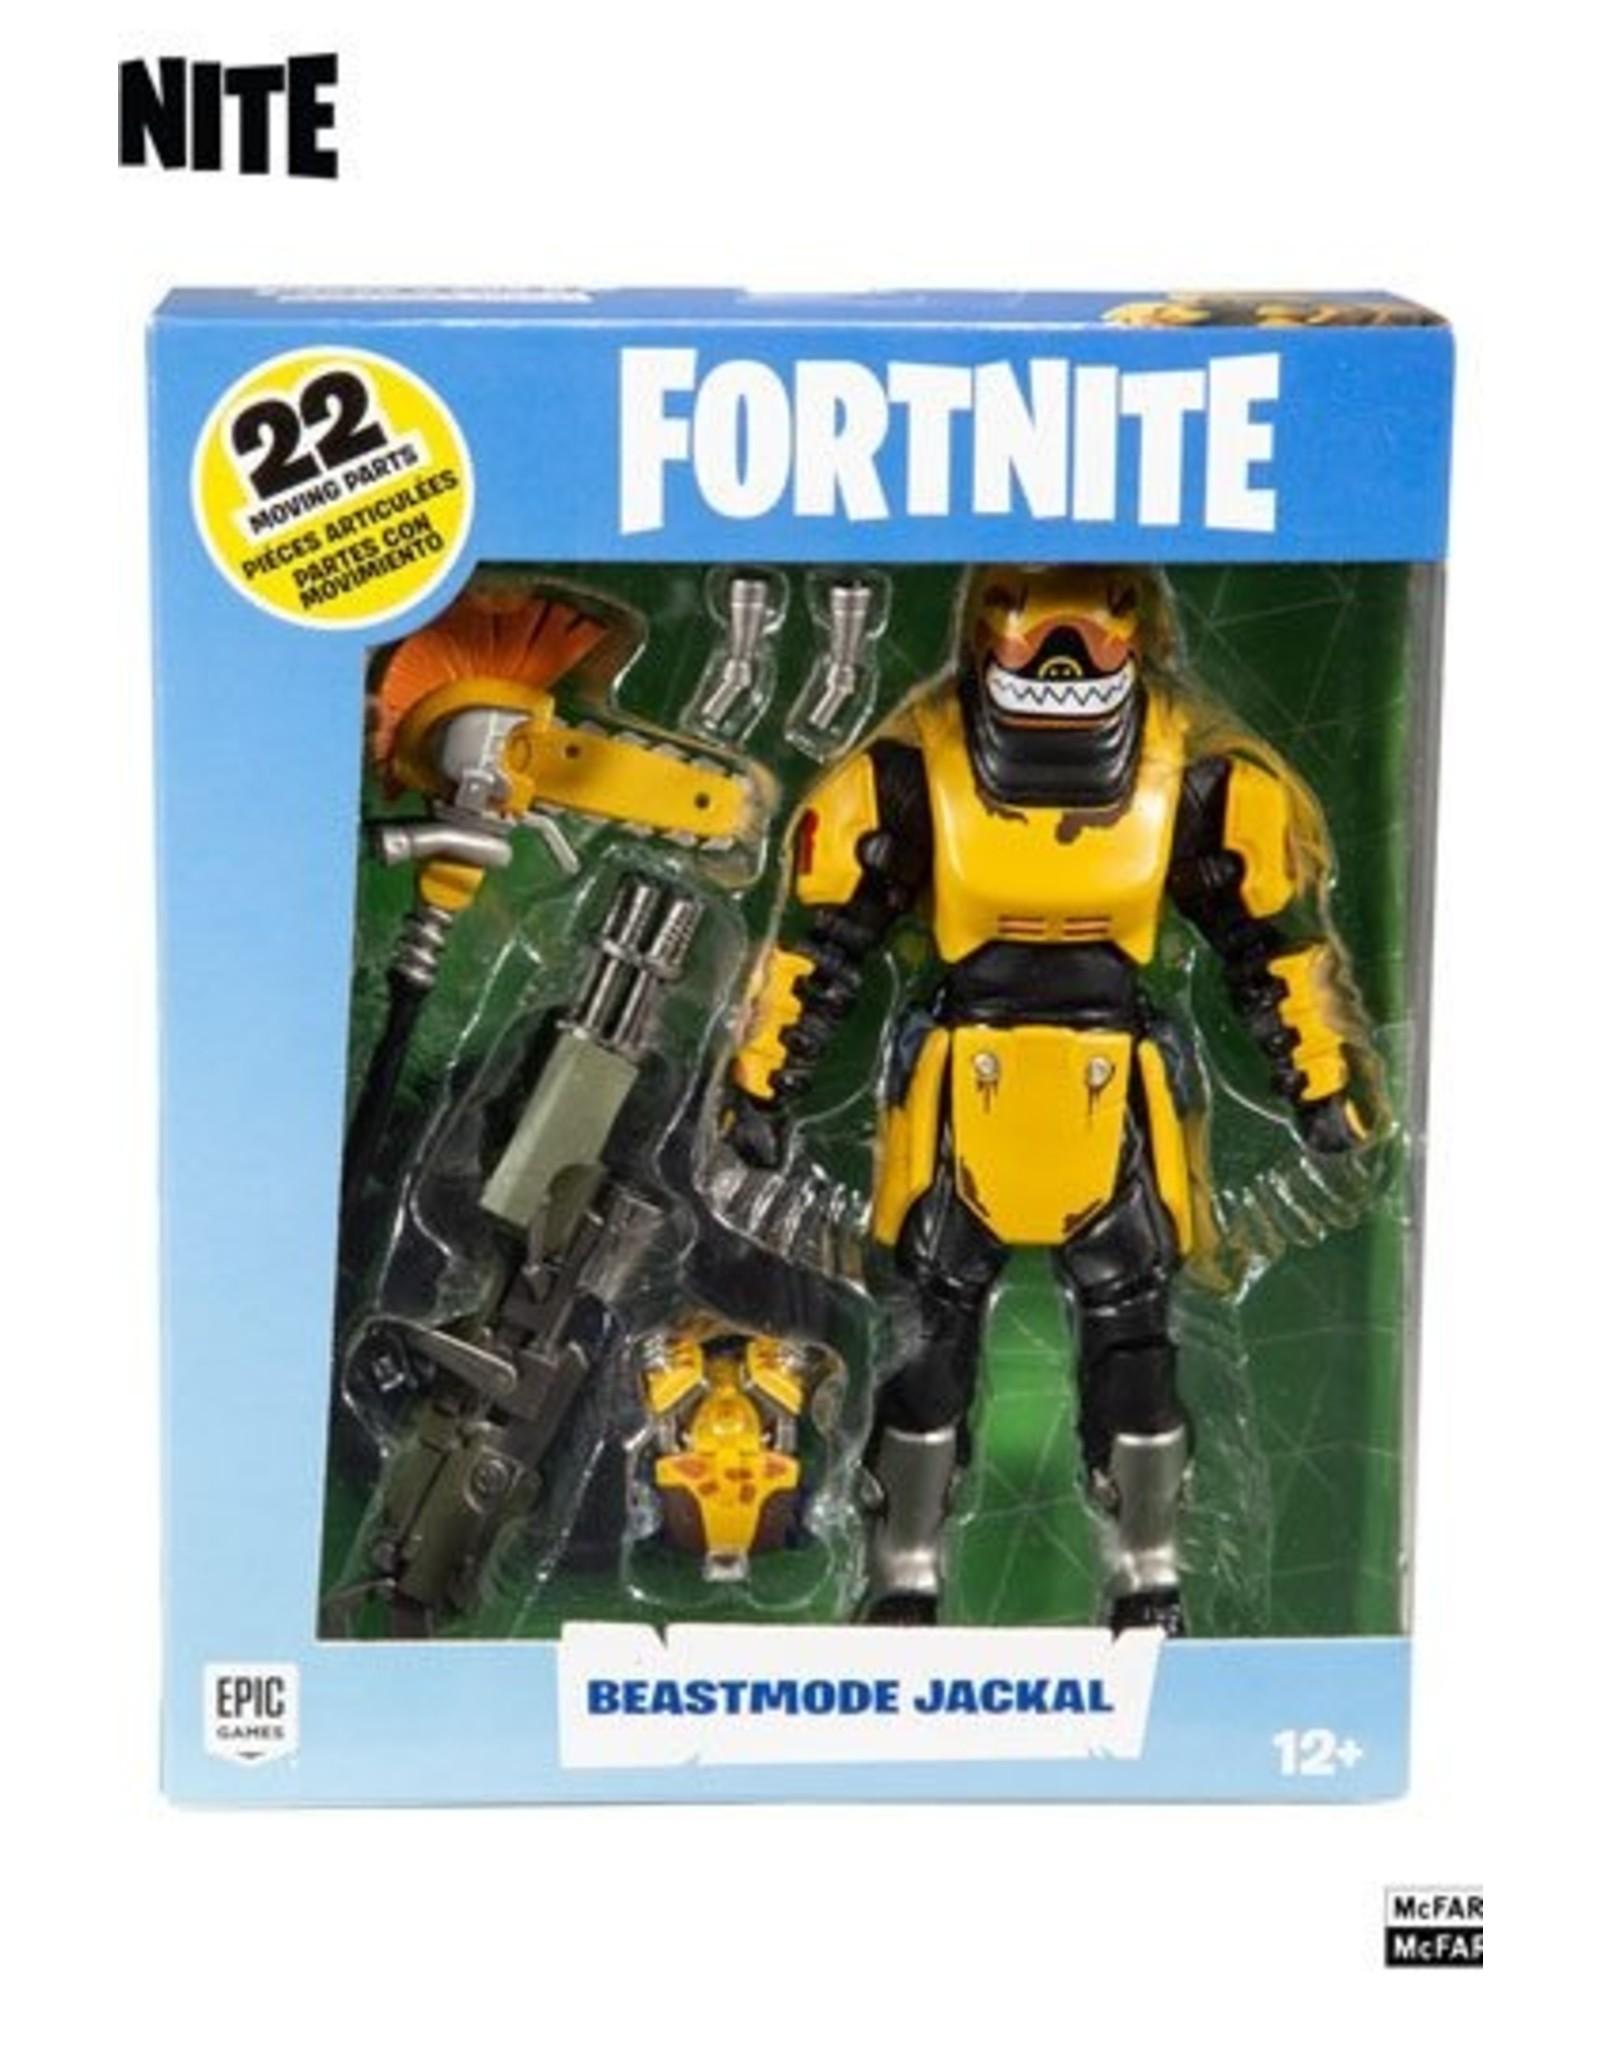 MCFARLANE TOYS Fortnite Action Figure Beastmode Jackal 18 cm